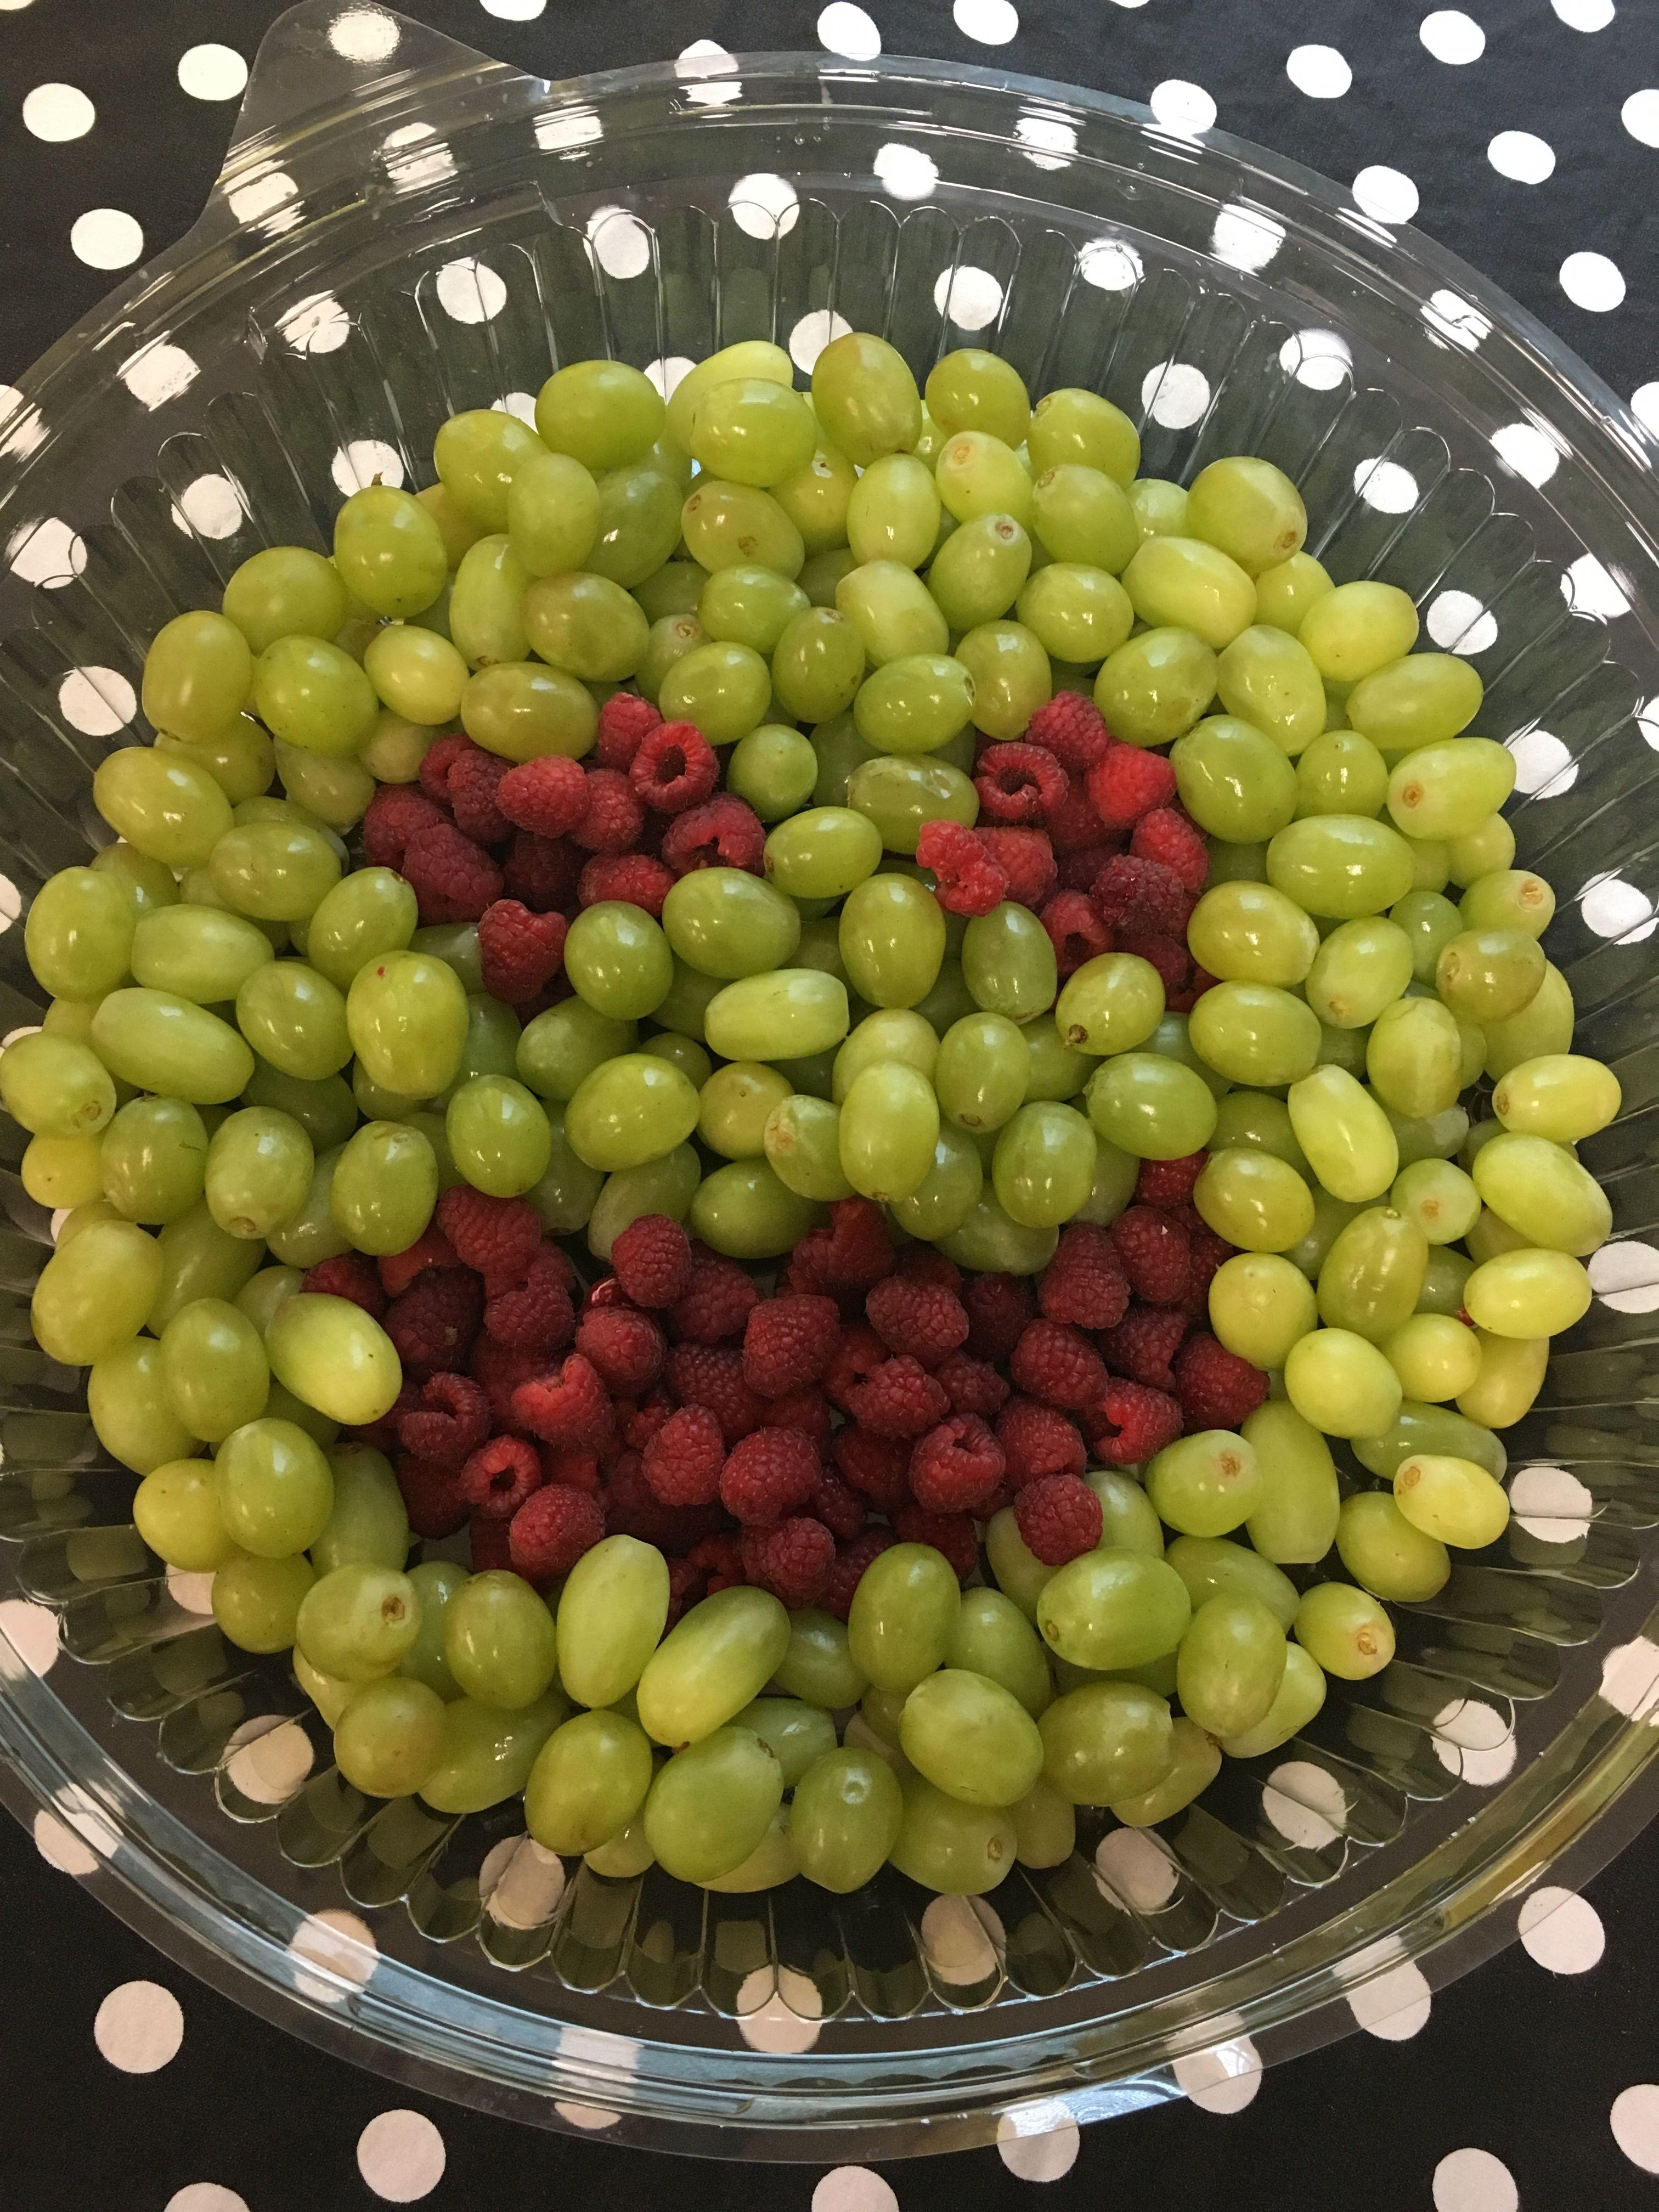 Pin By Traci Gonzalez On Emojis Food Fruit Fruit Salad